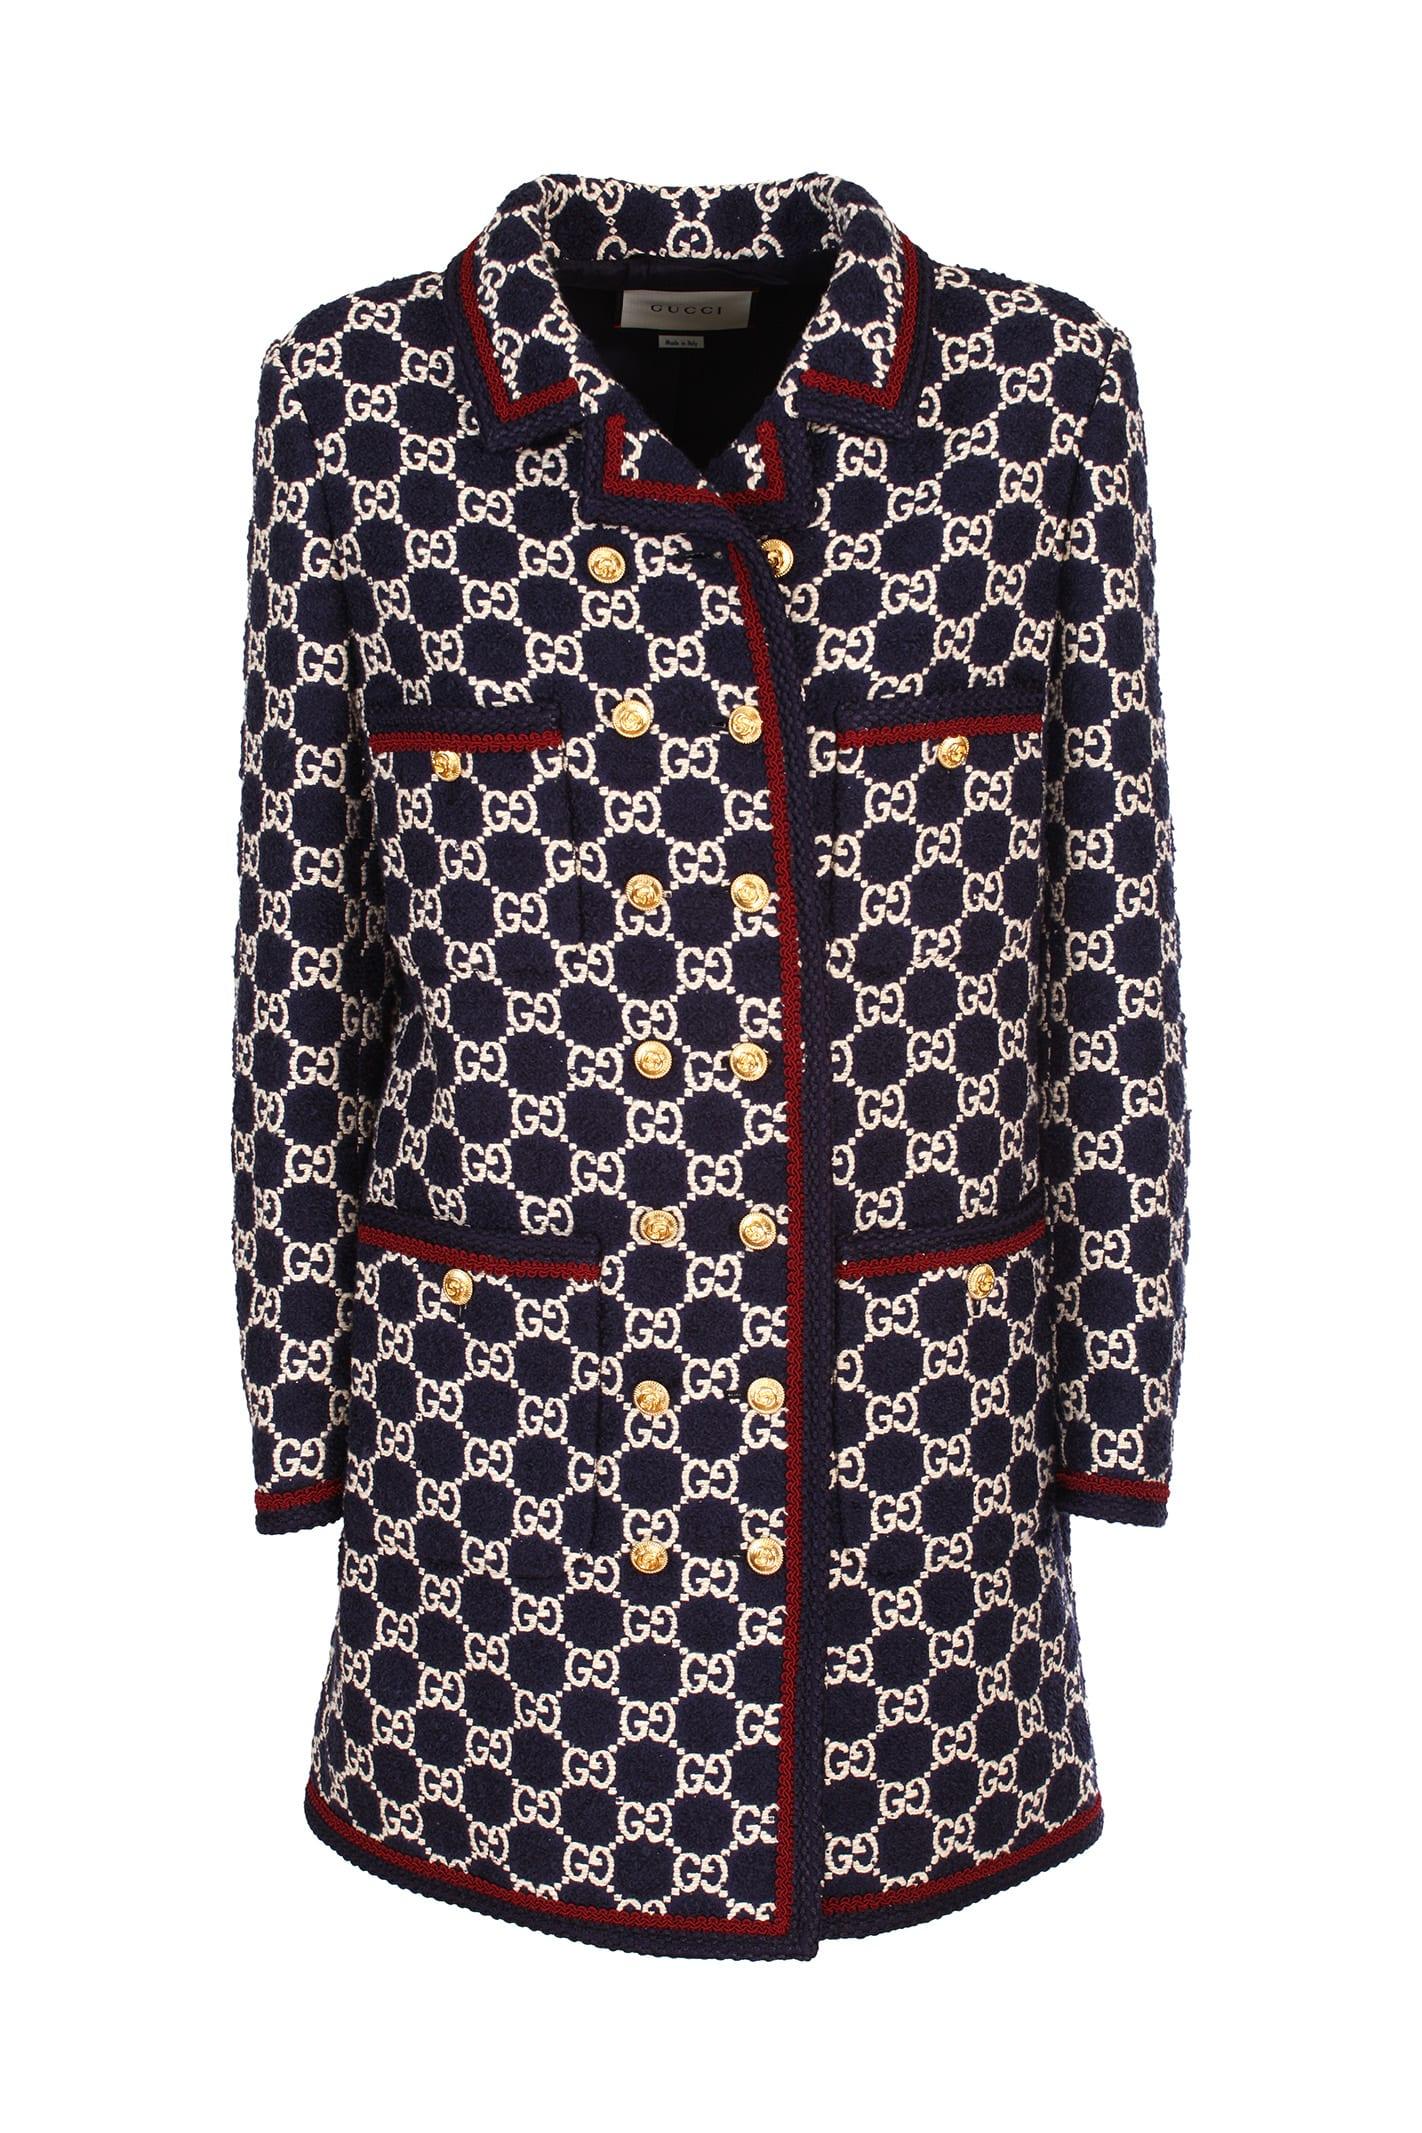 Gucci wide-cut coat